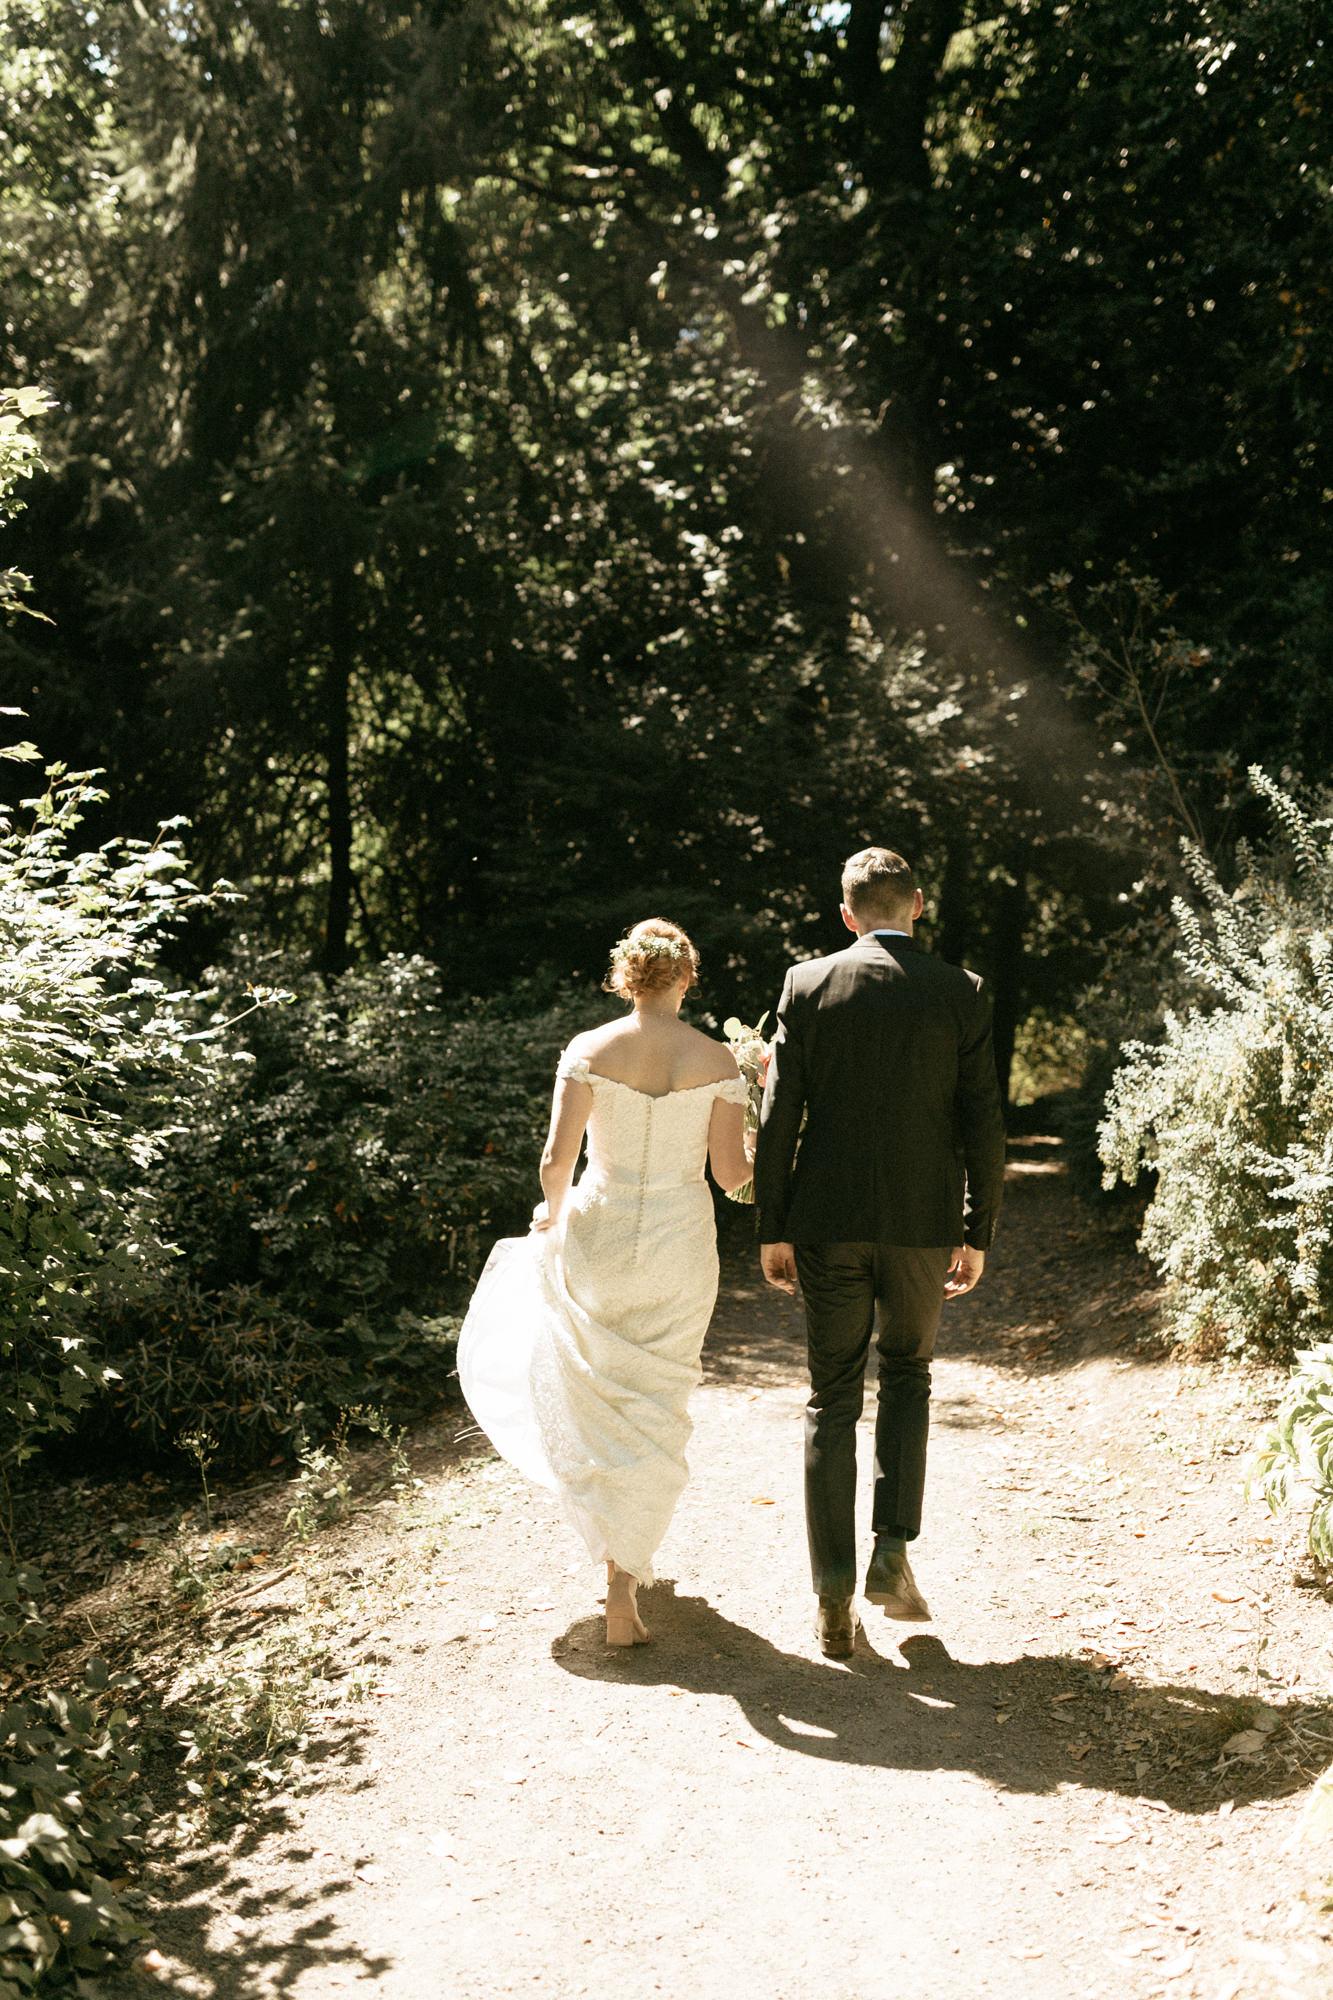 the_evergreen_portland_wedding-20.jpg